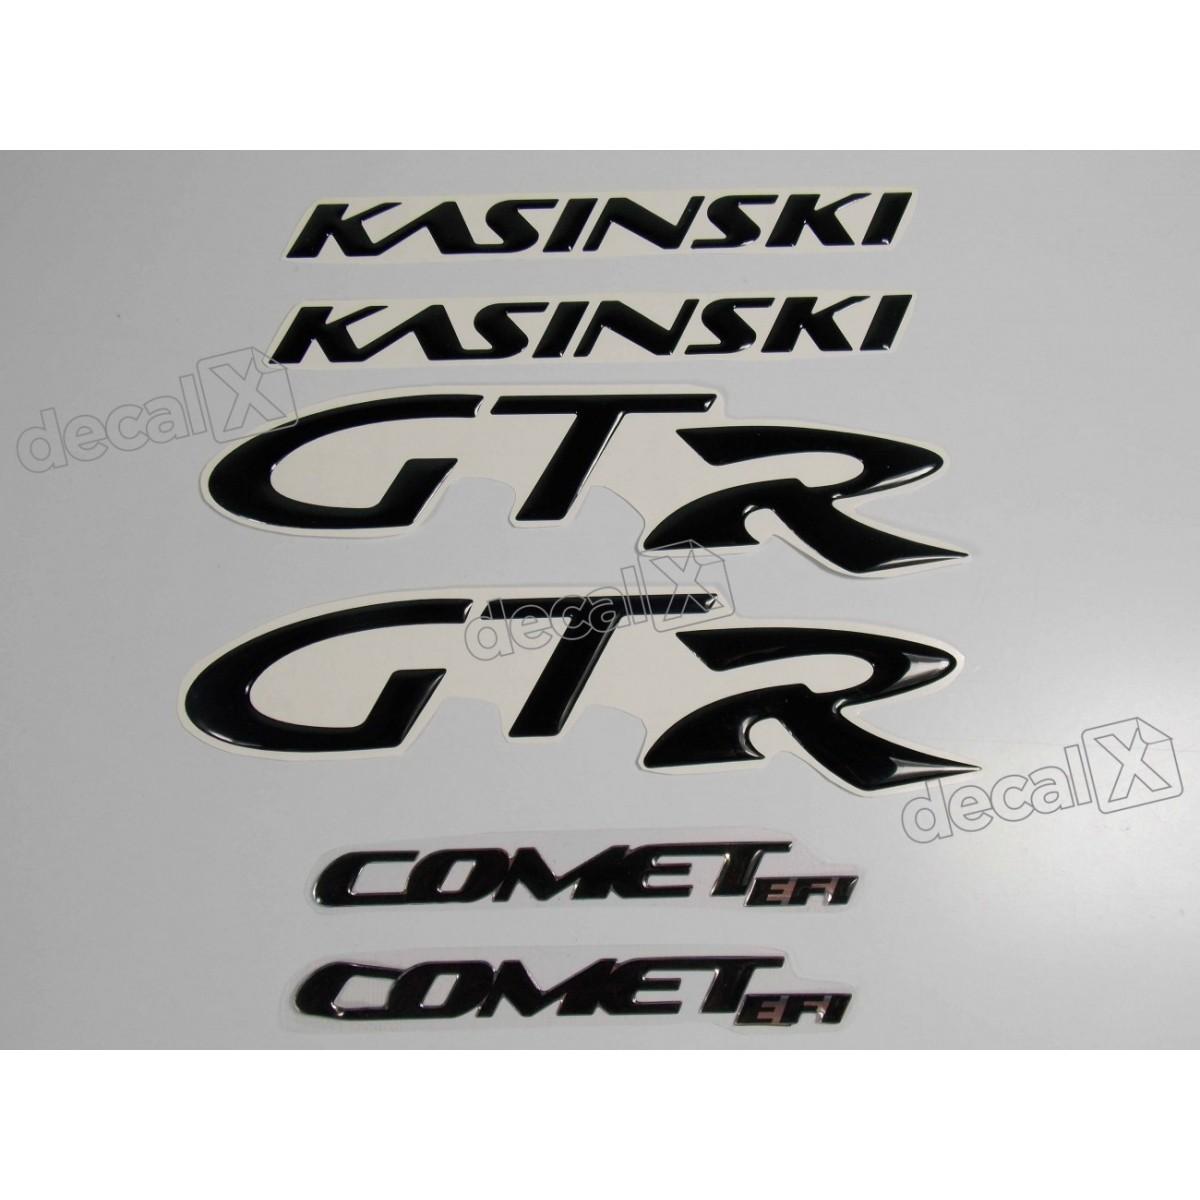 Kit Adesivos Kasinski Comet Gtr Resinado Preto Rs5 Decalx